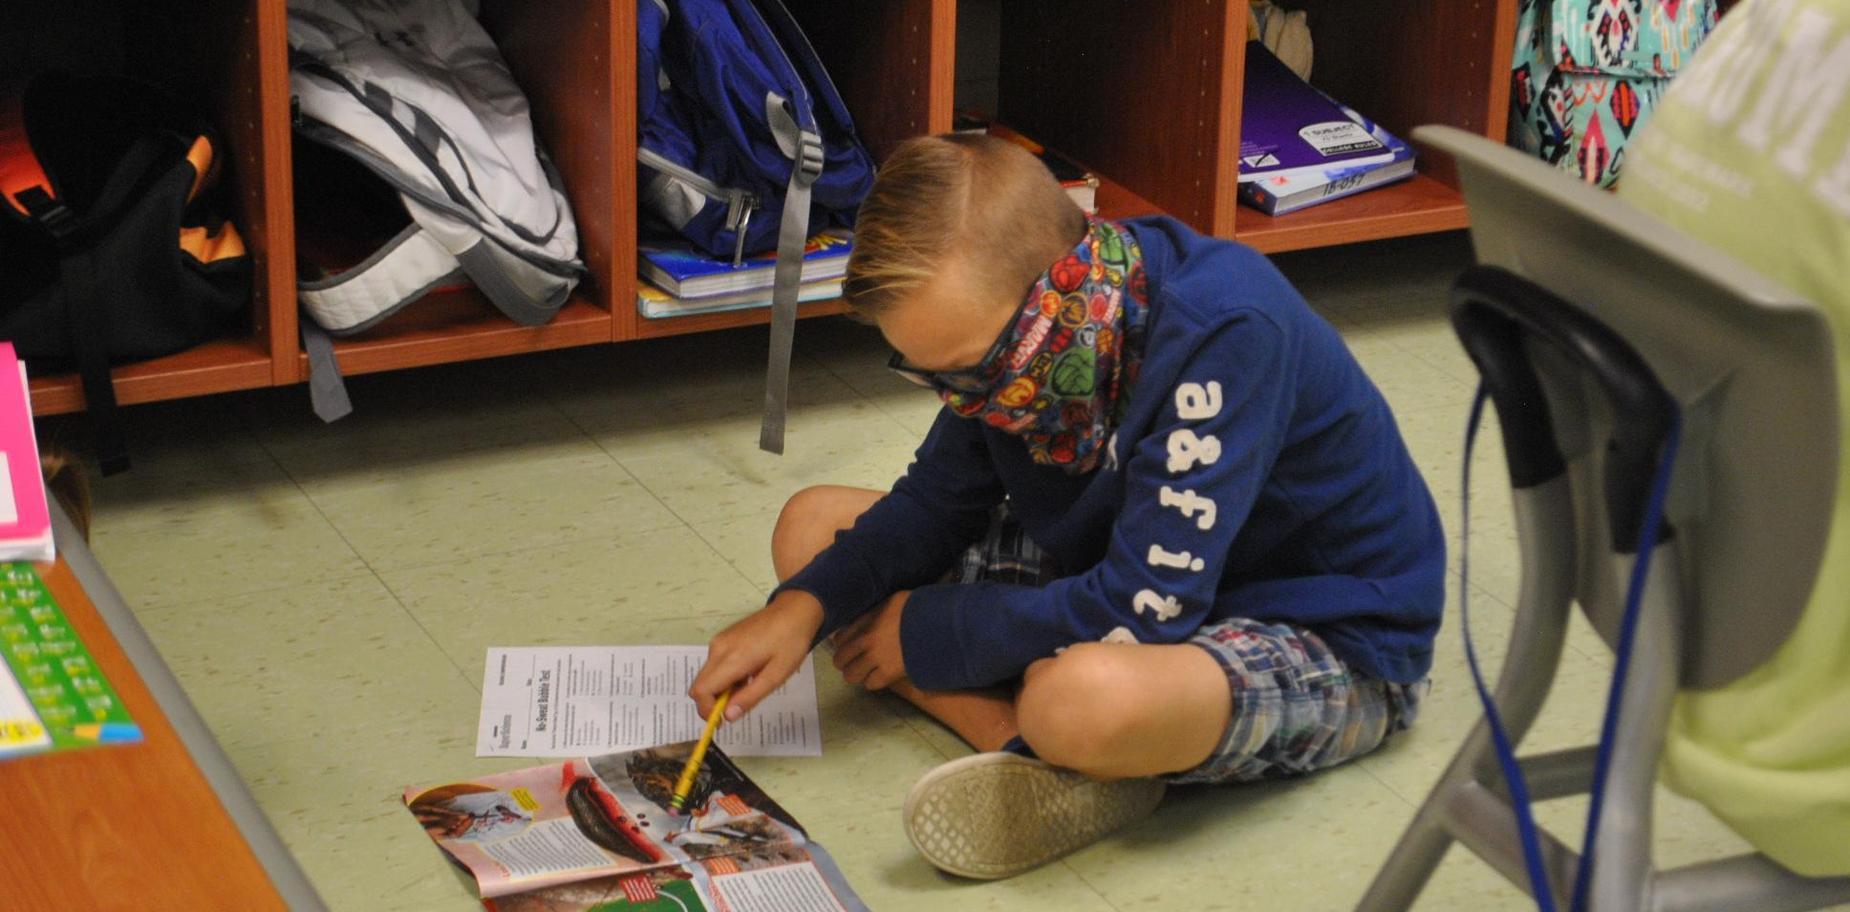 Student doing classwork